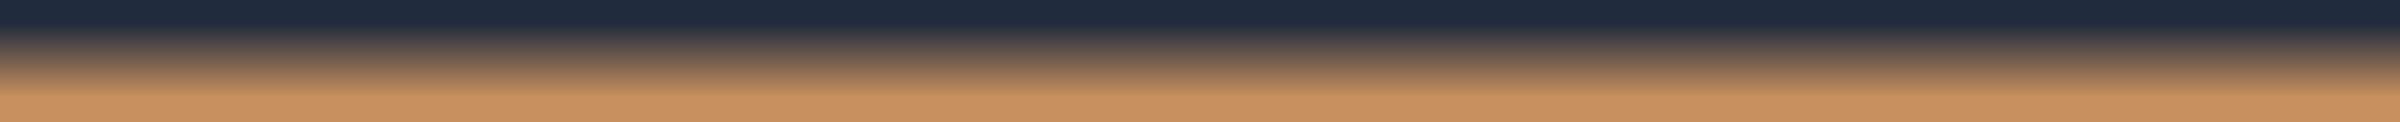 KWC-bg-bluegold-blur